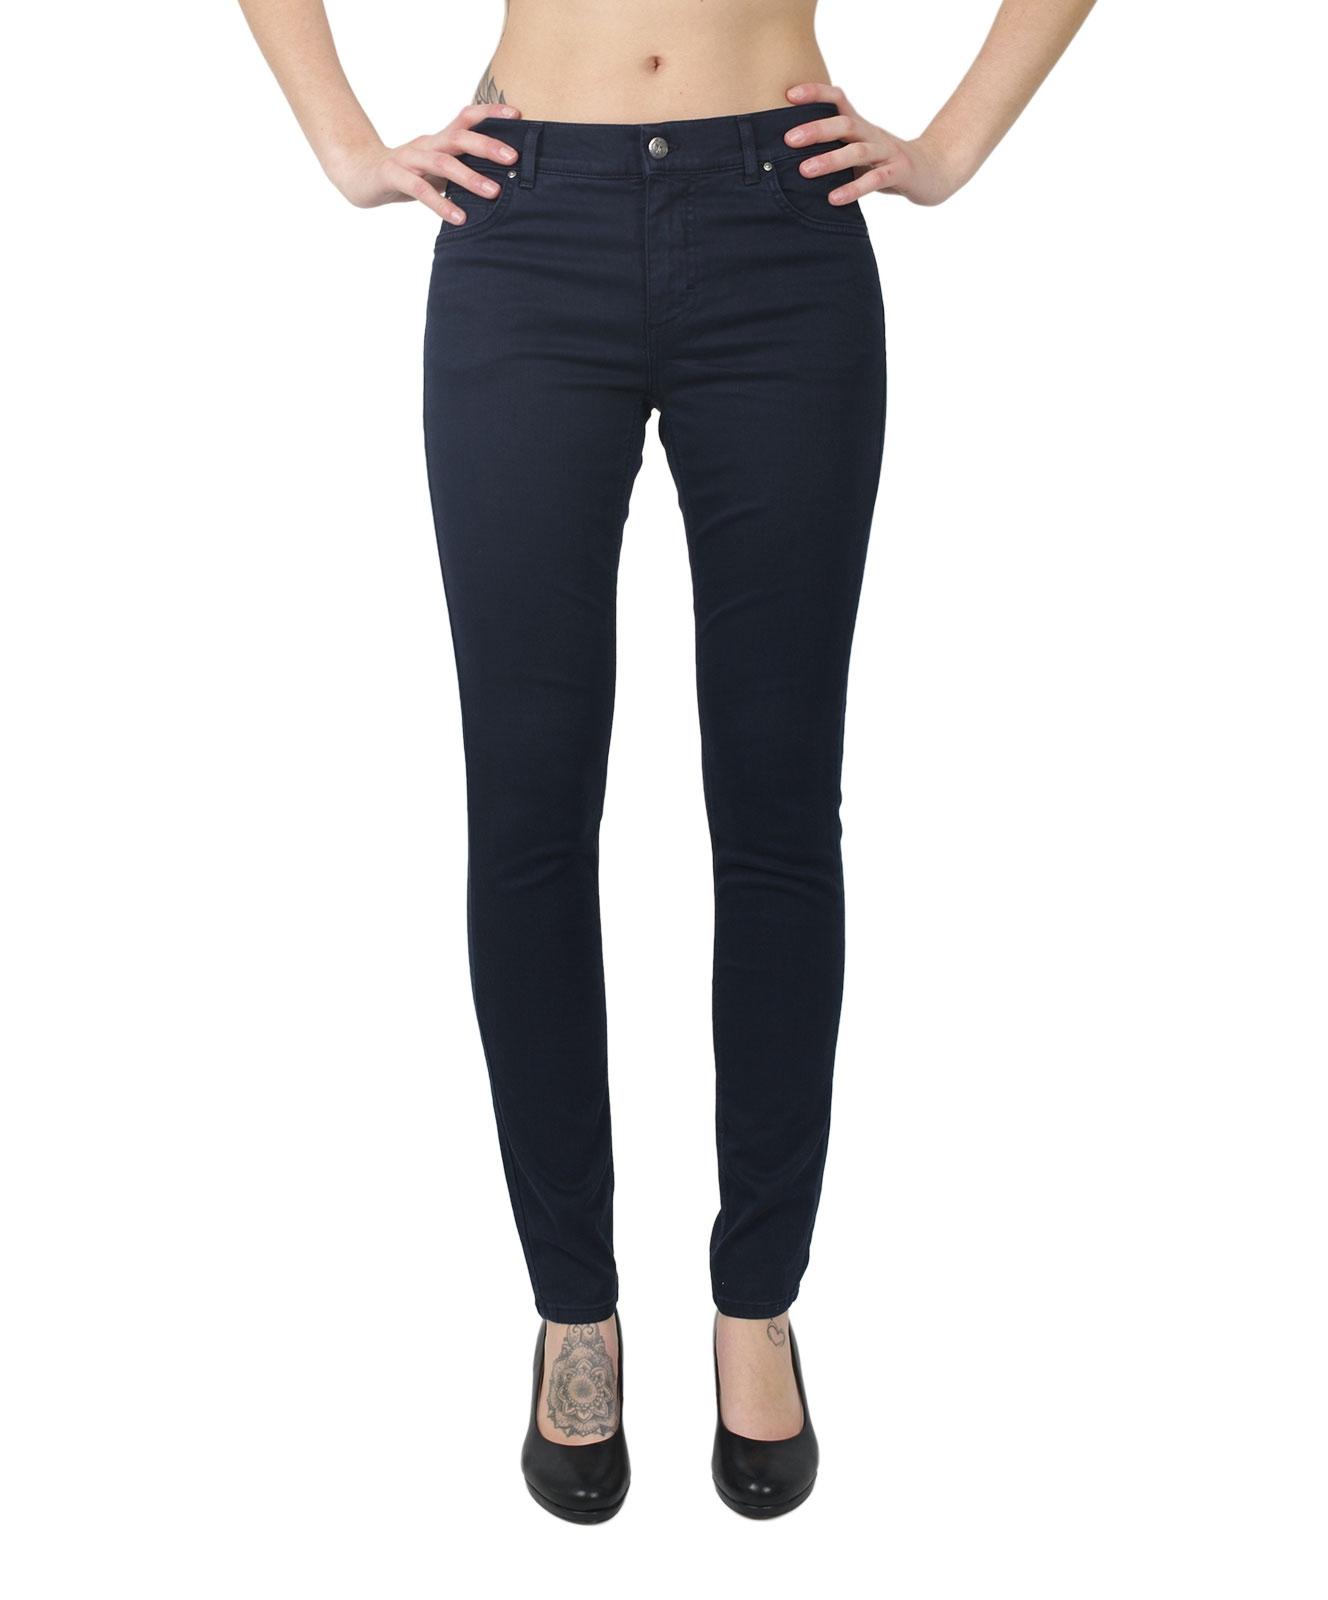 Hosen - Angels Jeans Röhre Skinny in Midnight Blue  - Onlineshop Jeans Meile